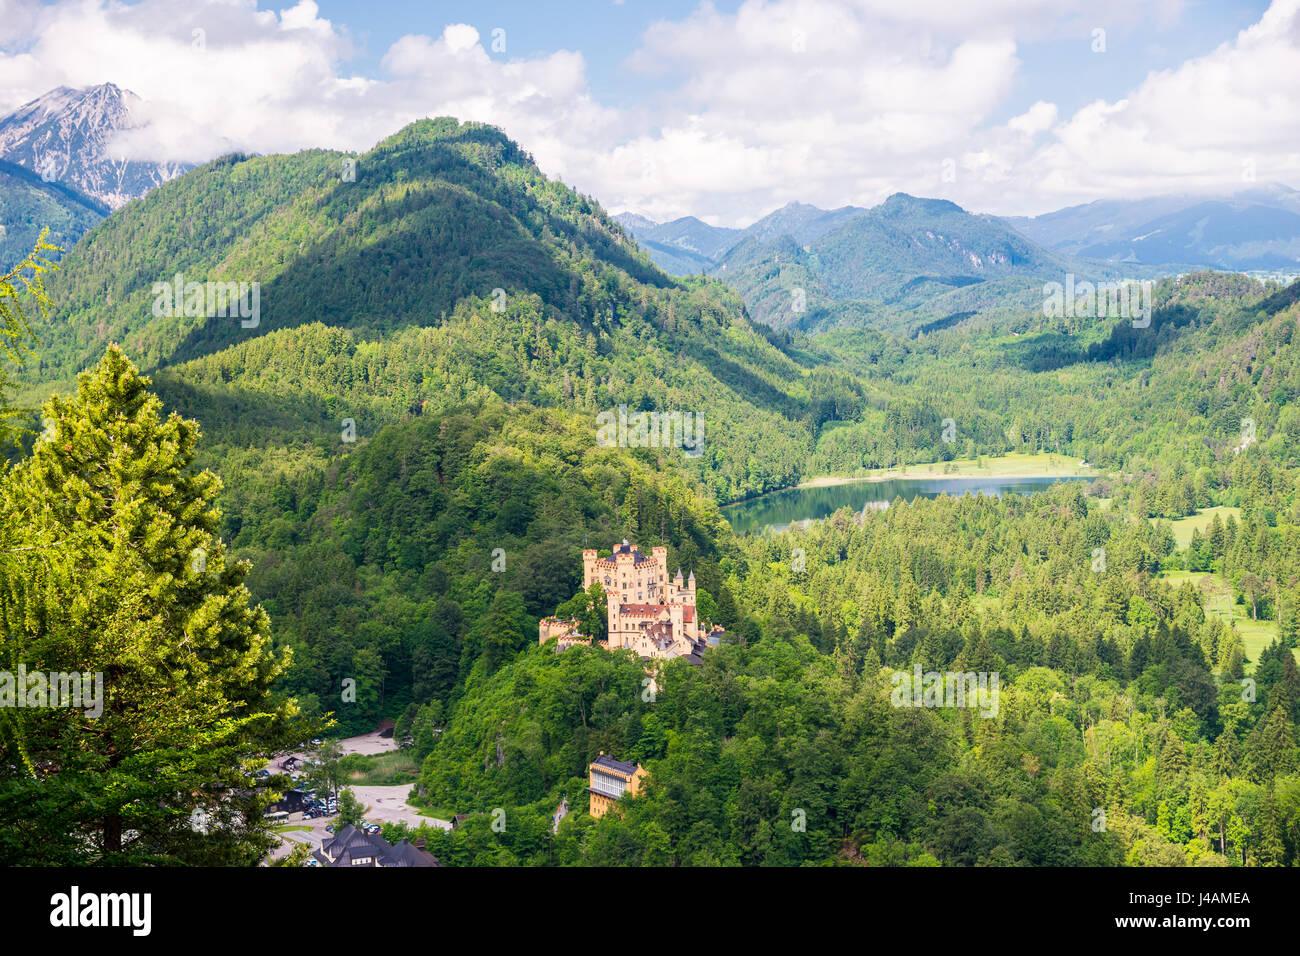 Hohenschwangau Castle, Romanesque Revival palace, Hohenschwangau, Fussen, Bavaria, Germany - Stock Image